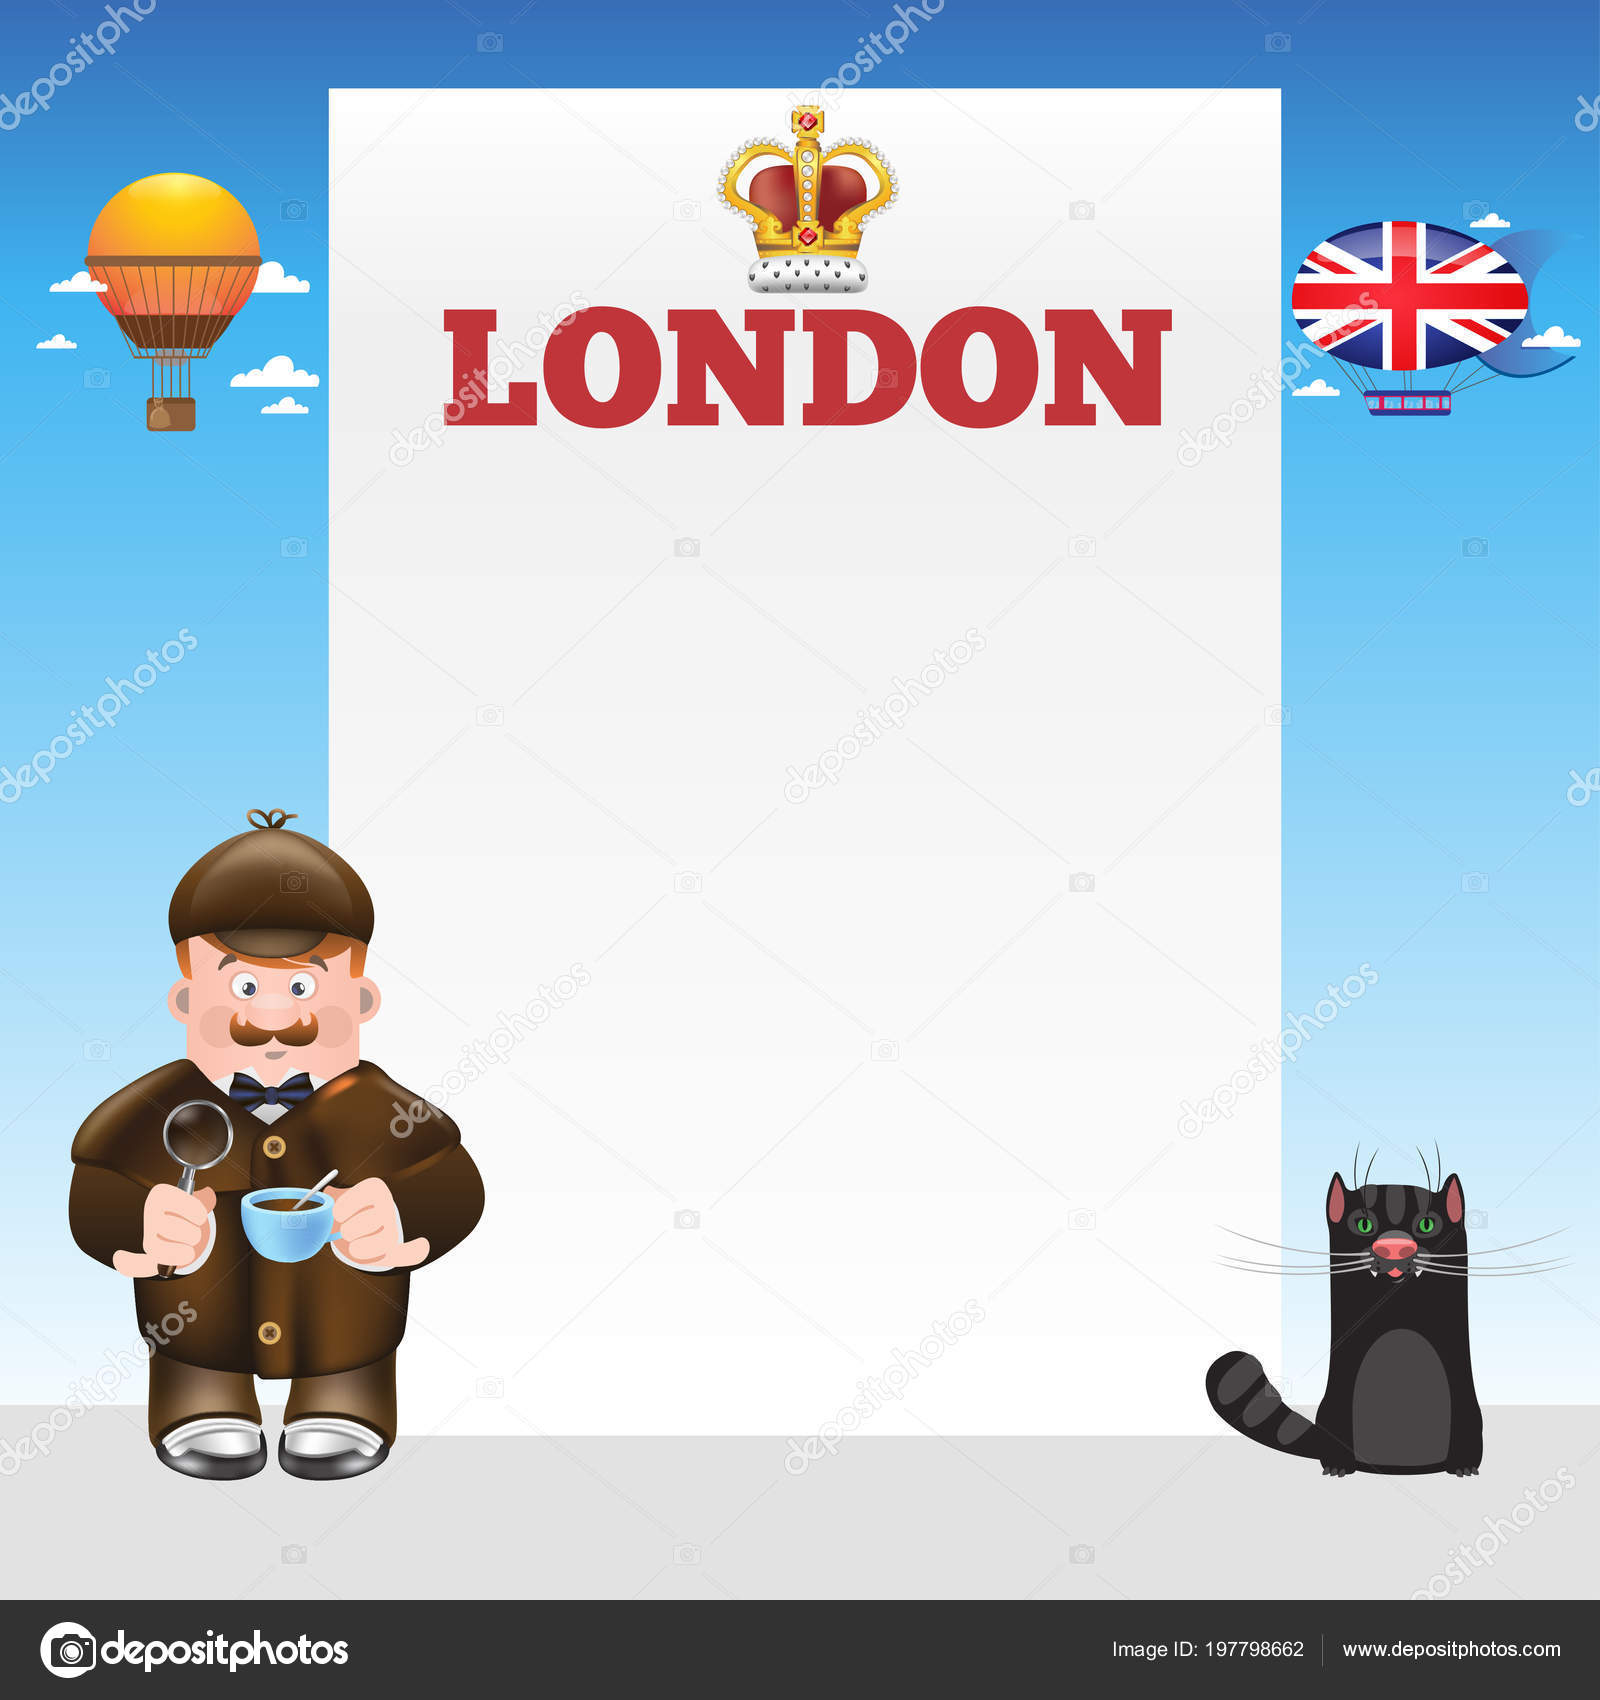 london sherlock holmes template design tourist posters brochures